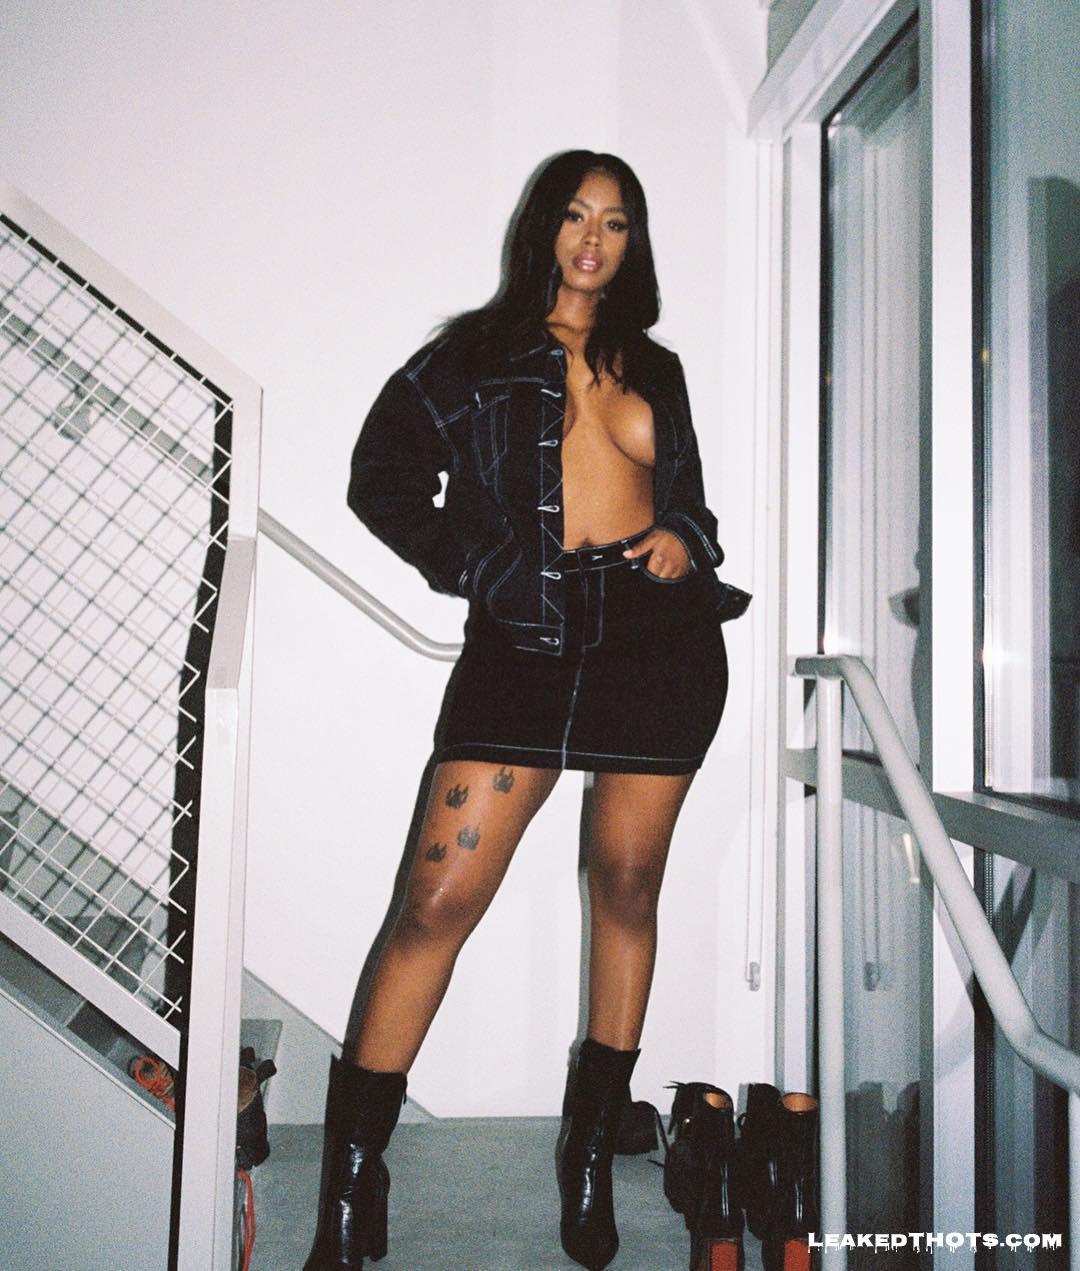 Raven Tracy | LeakedThots 45